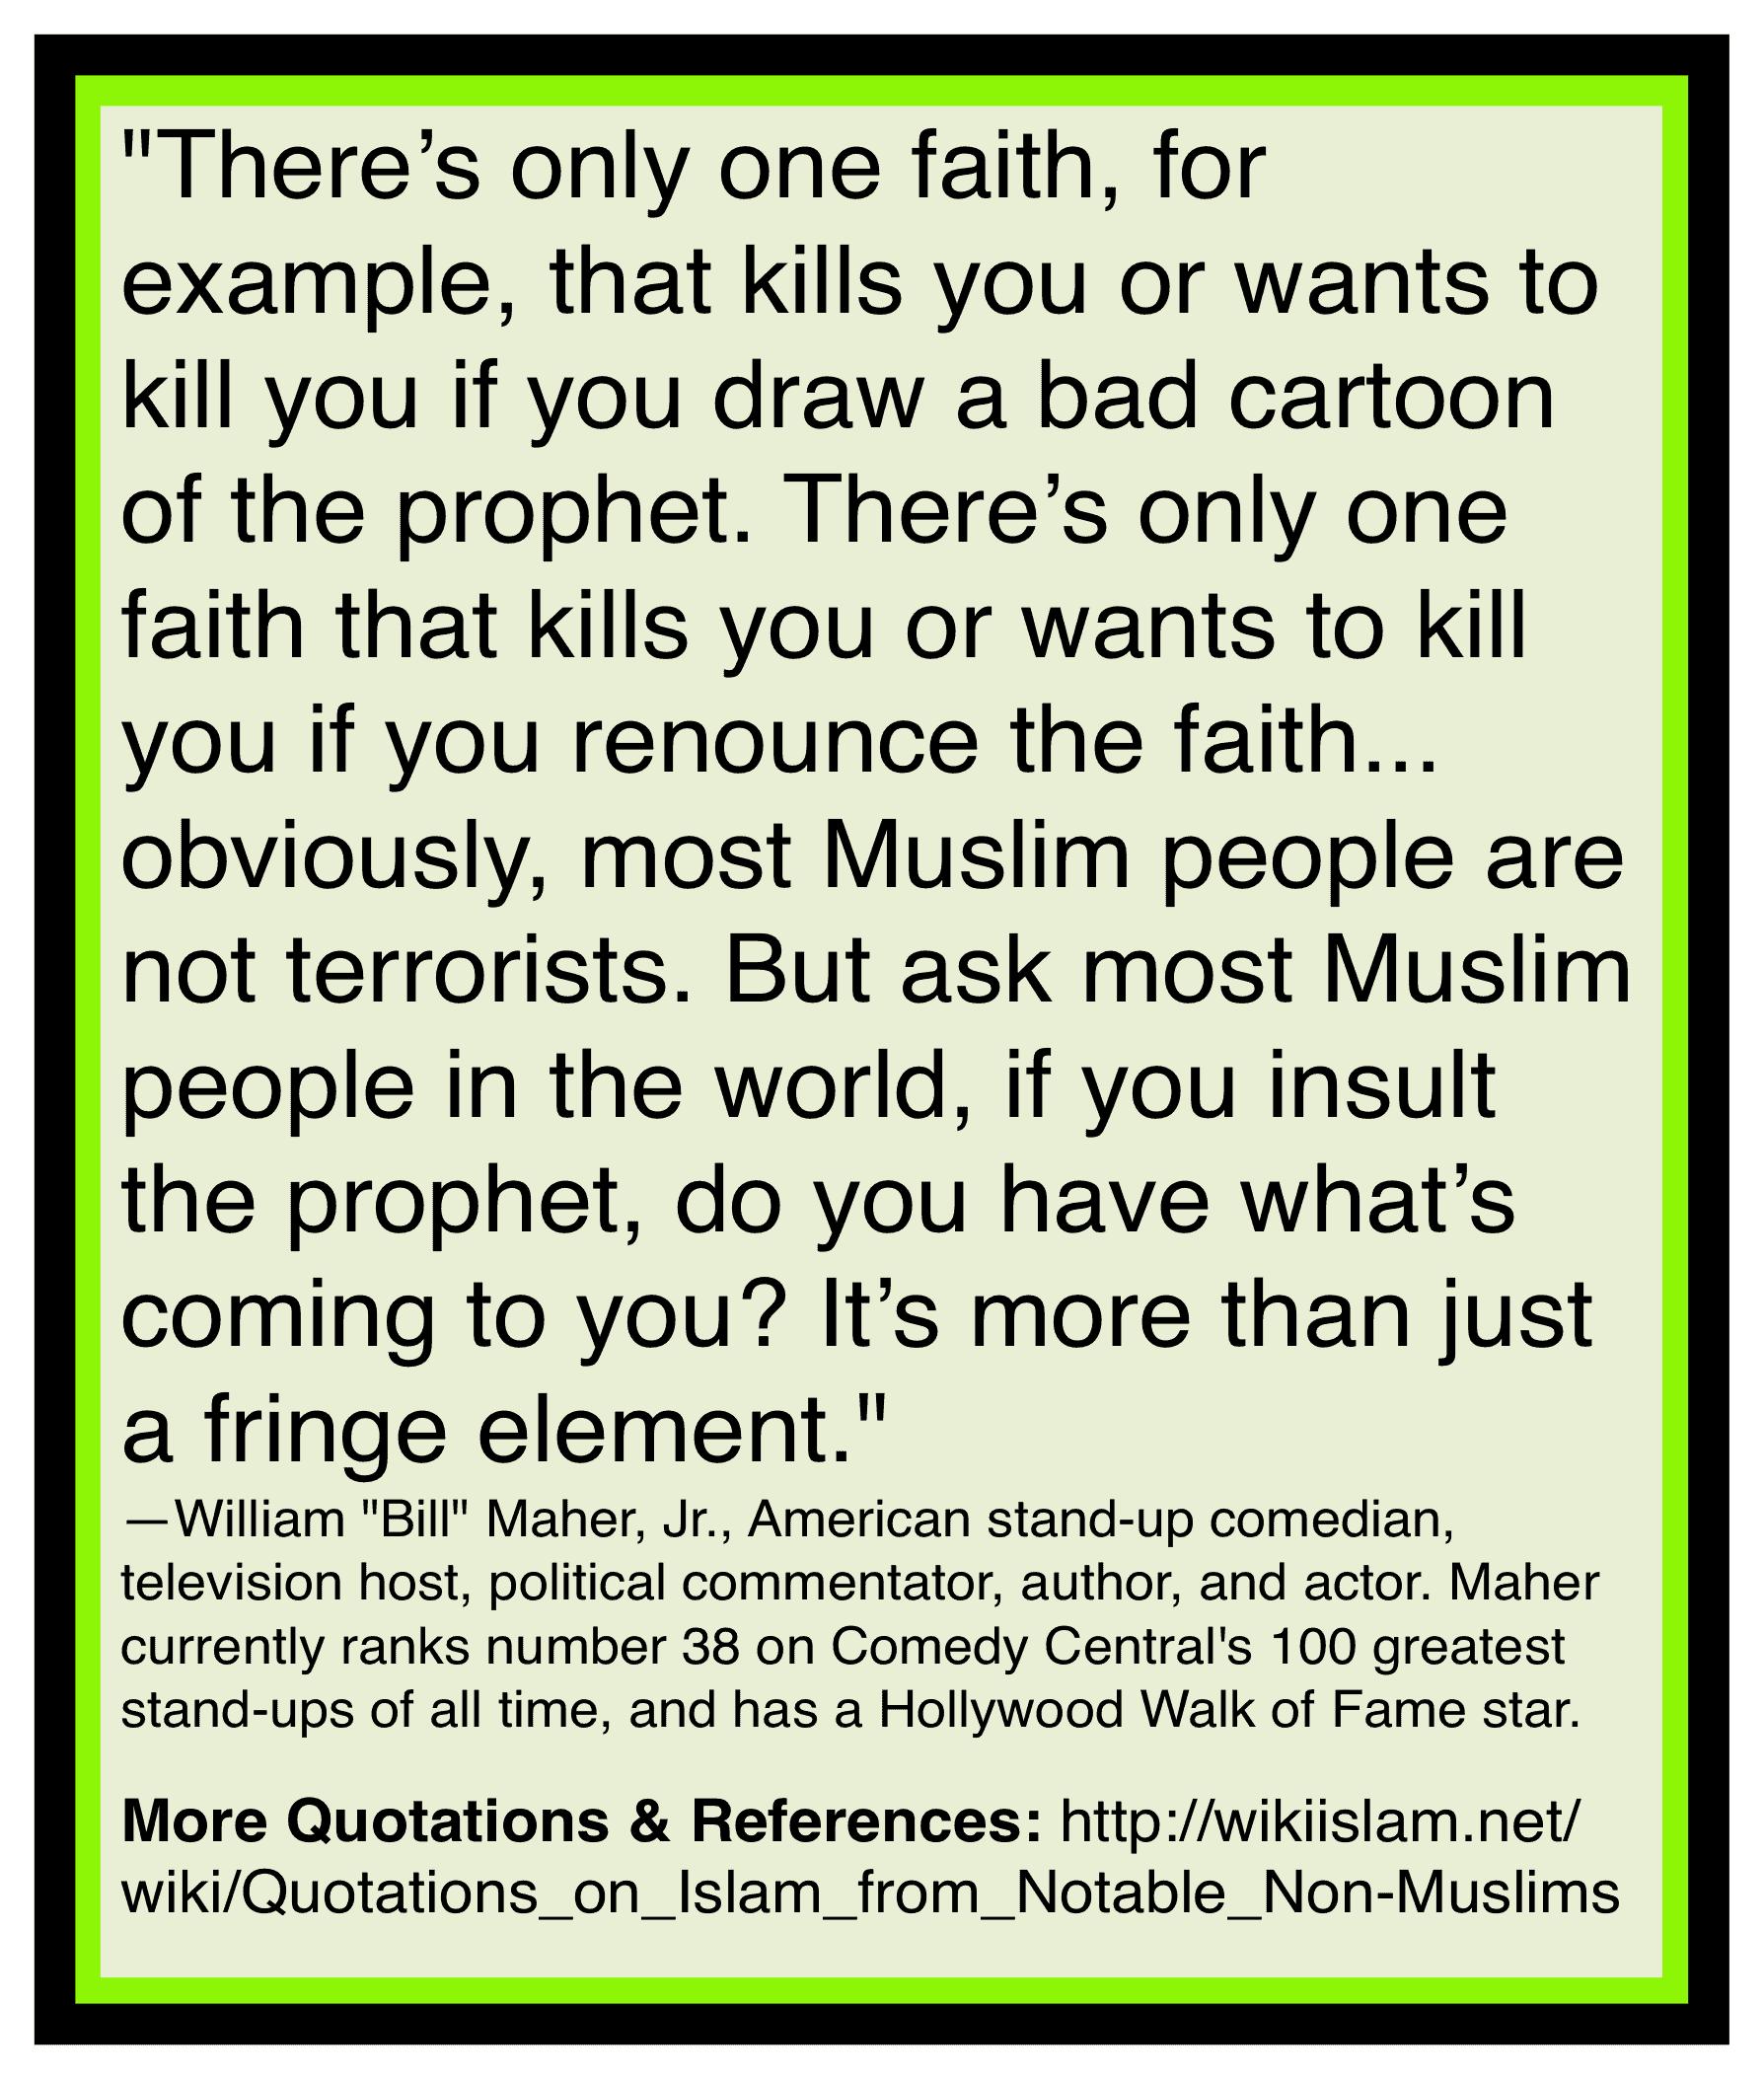 Islam murders for cartoons